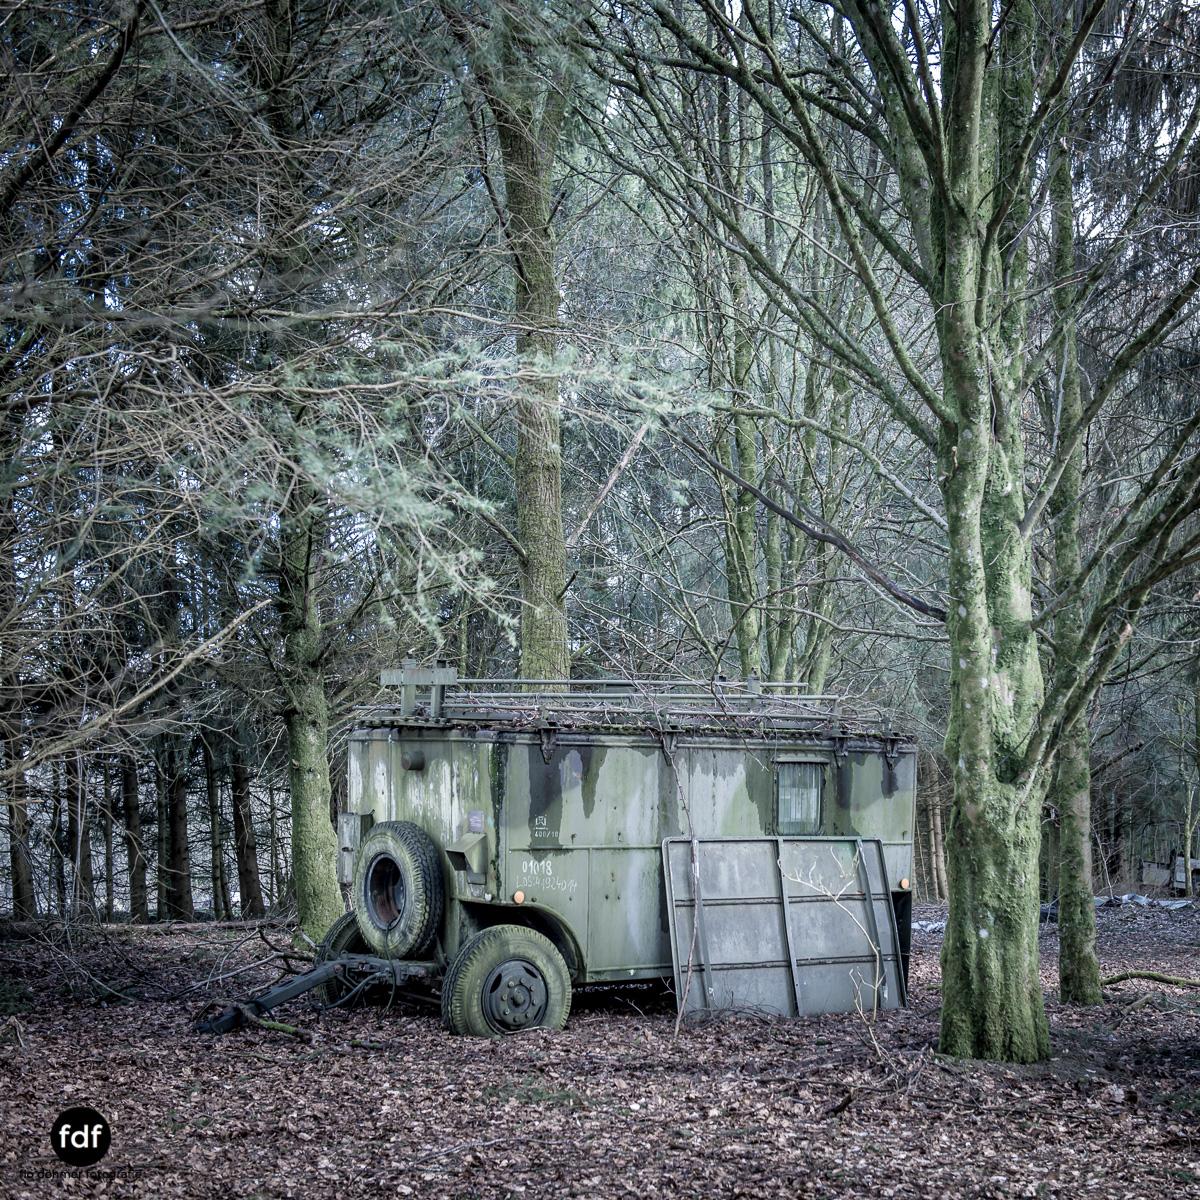 Traction Sud-Schrott-Militär-Lost Place-8.JPG